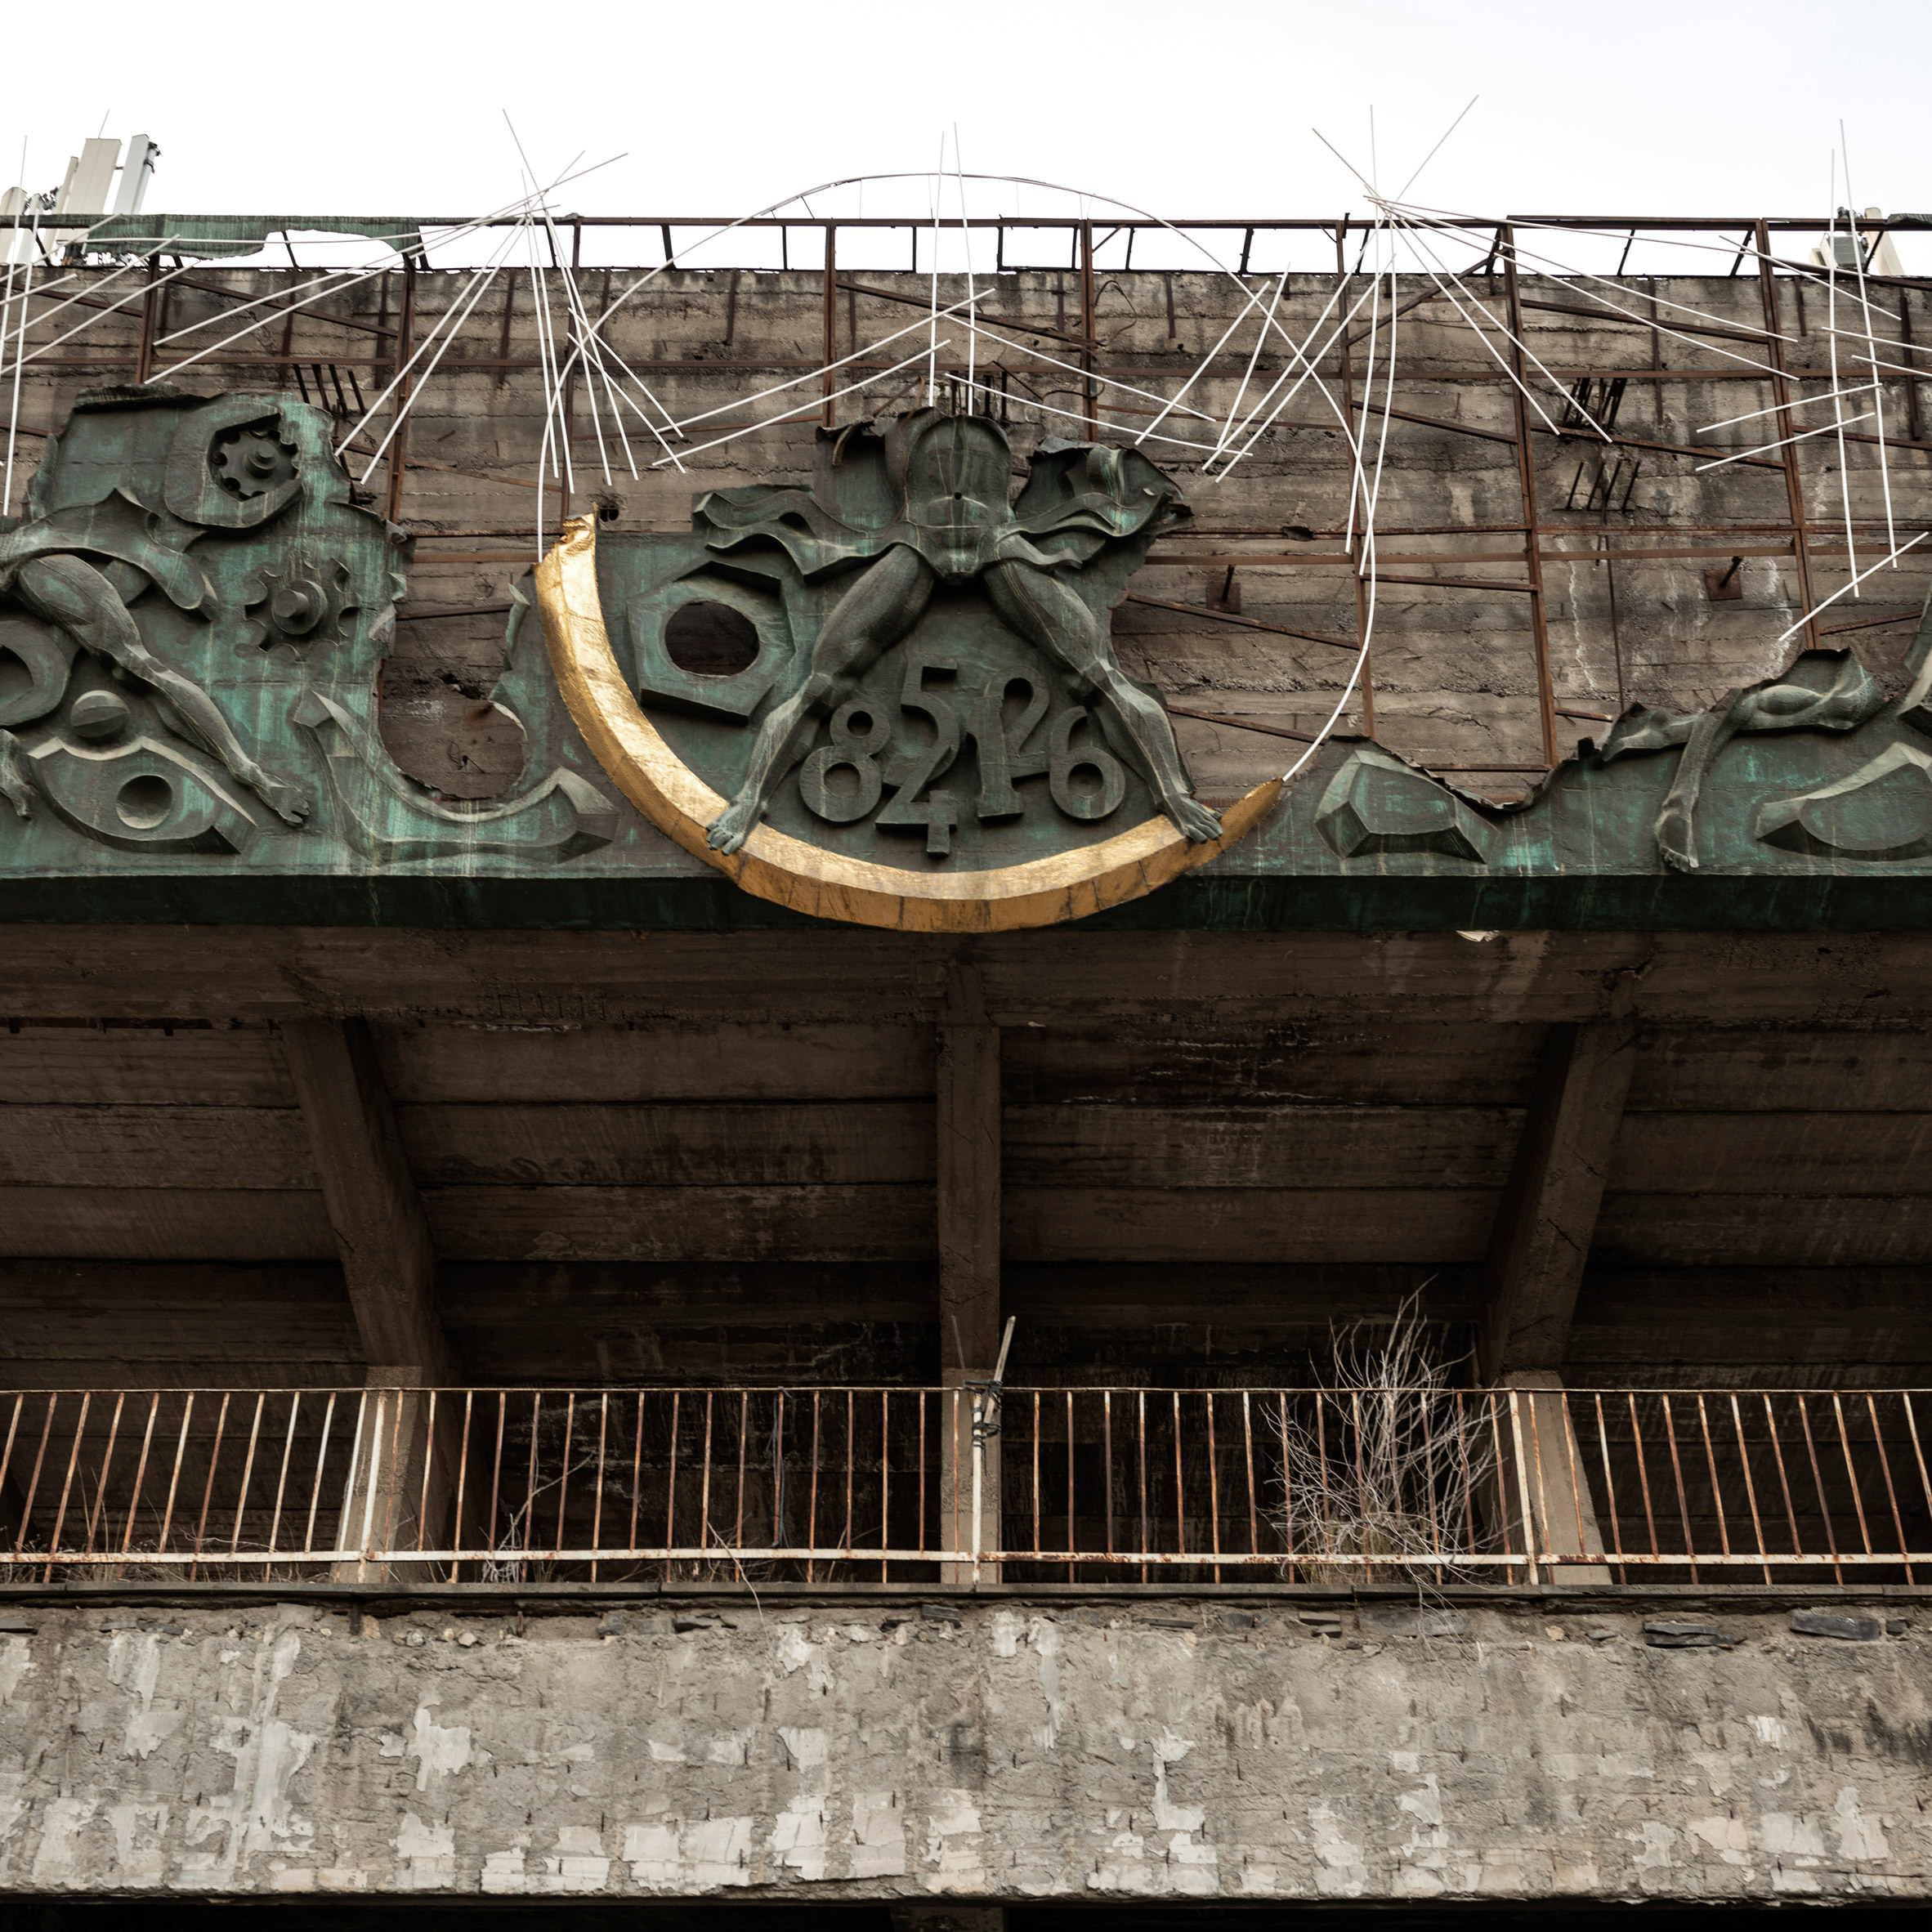 Tbilisi Architecture Biennial roundups